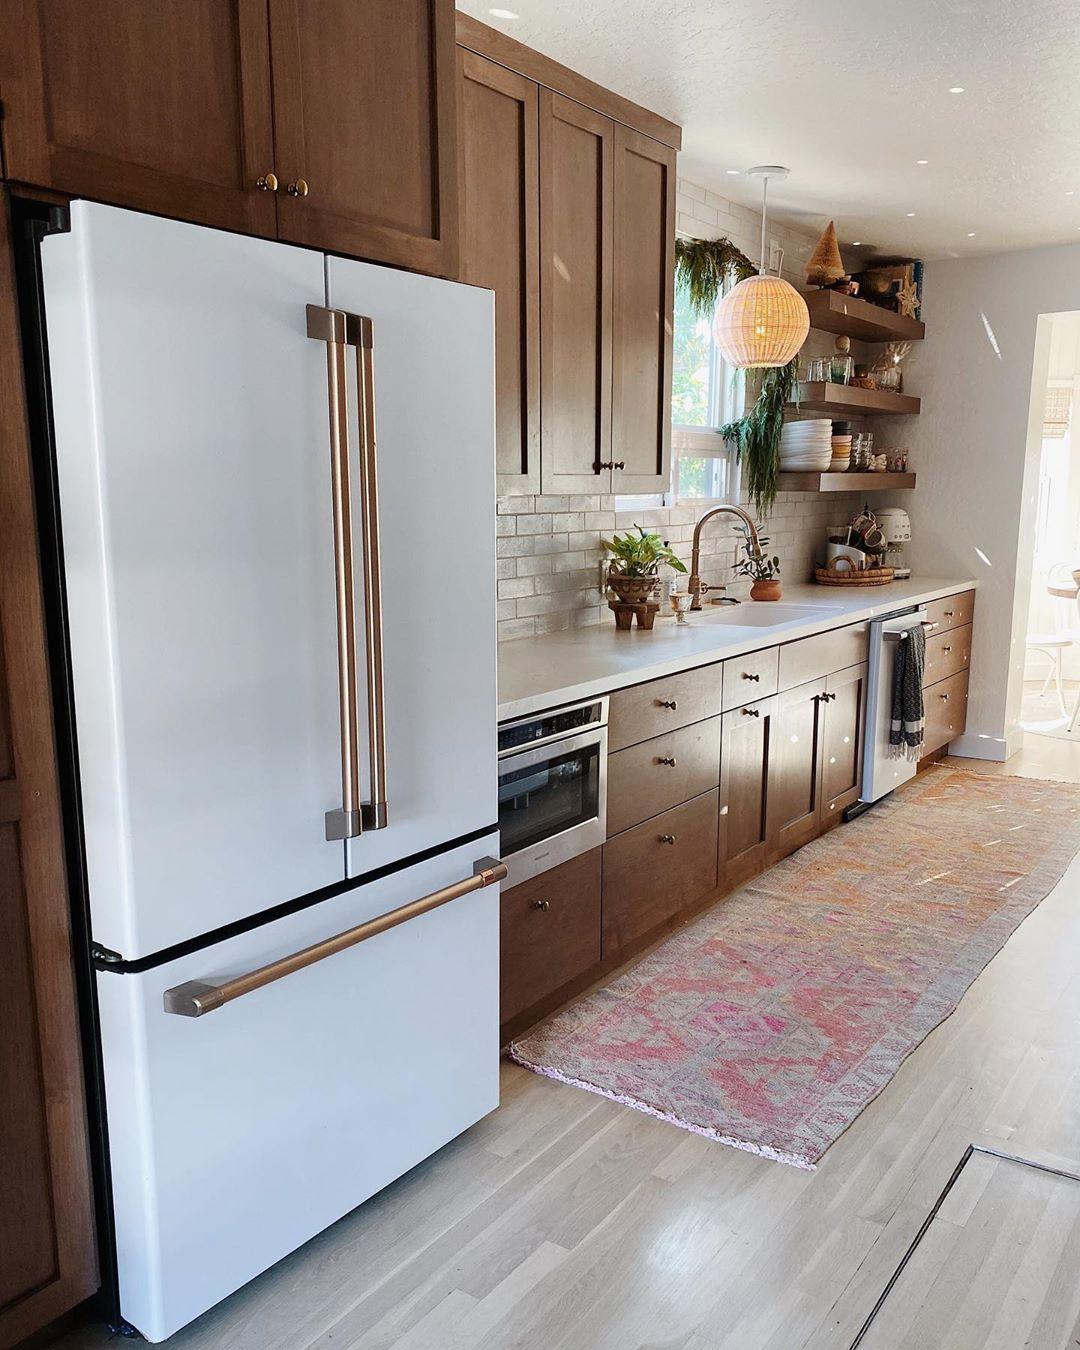 A S H L E Y P E T R O N E On Instagram Hooooome I Forgot To Clean A Bag Of Wil Dark Wood Kitchen Cabinets White Kitchen Appliances Clean Kitchen Cabinets